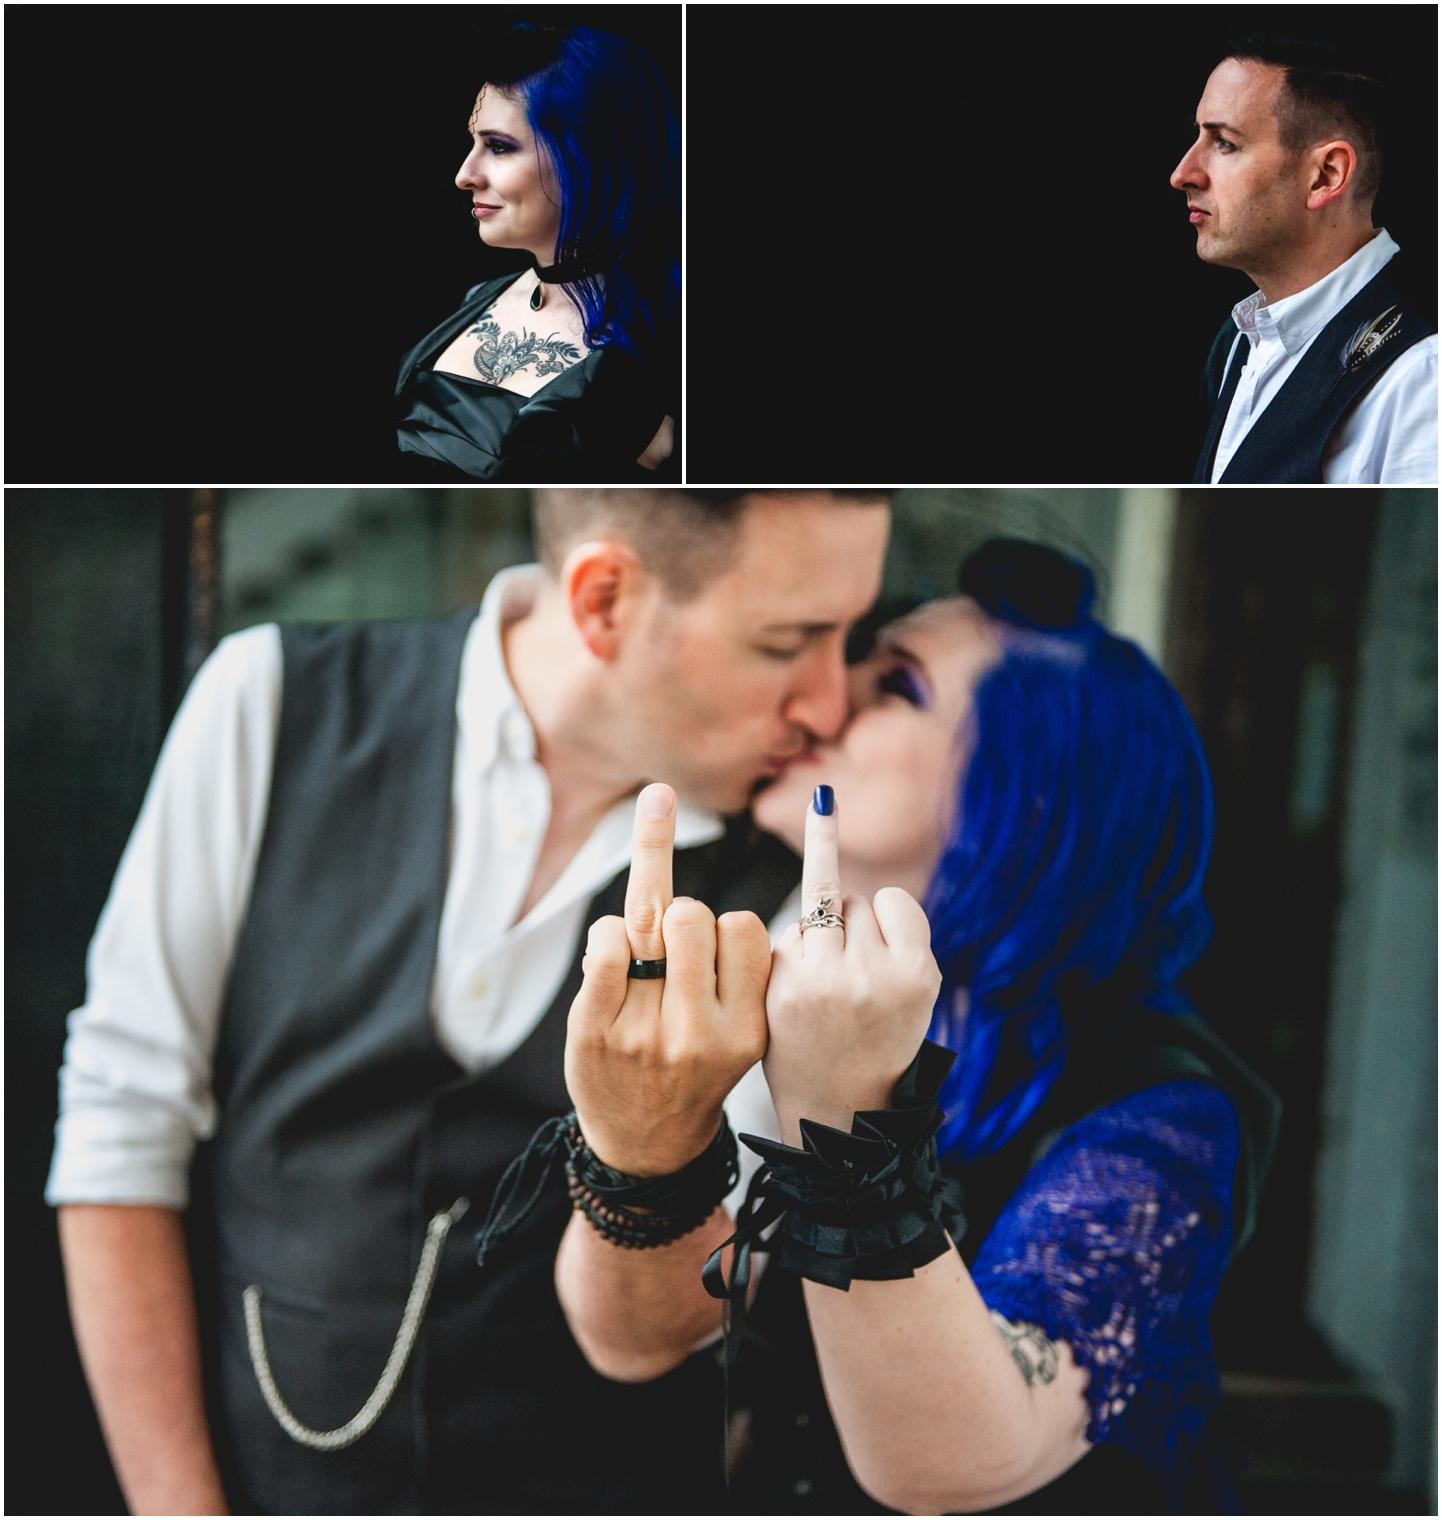 Bond Company Wedding, Digbeth, Lisa Carpenter Photography, Birmingham, goth wedding, alternative wedding, photos, rings